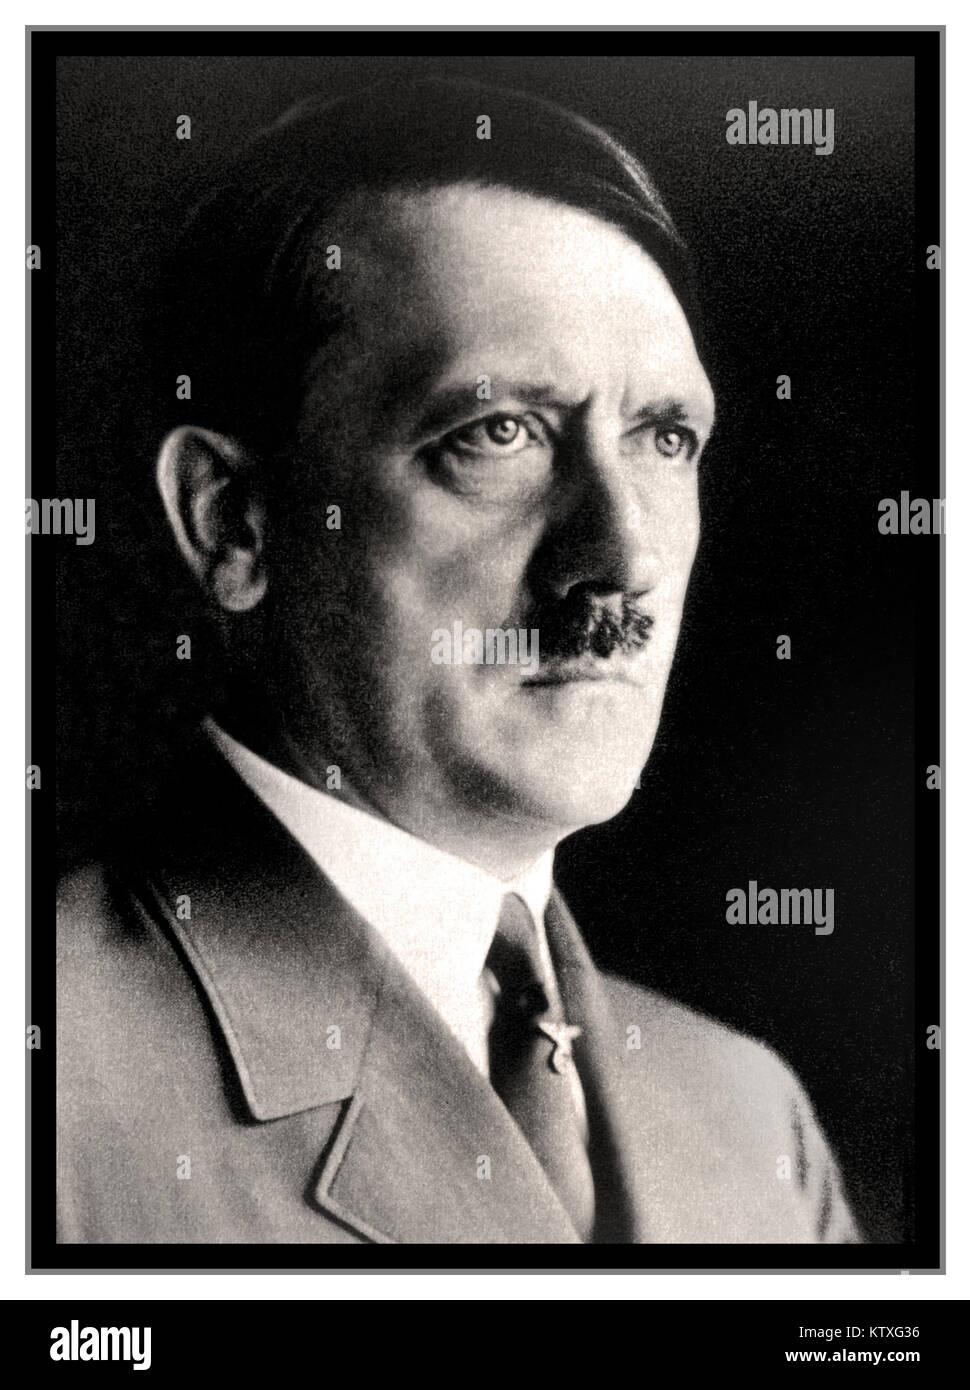 ADOLF HITLER PORTRAIT 1930's B&W studio posed head and shoulder portrait photograph of Adolf Hitler in uniform - Stock Image